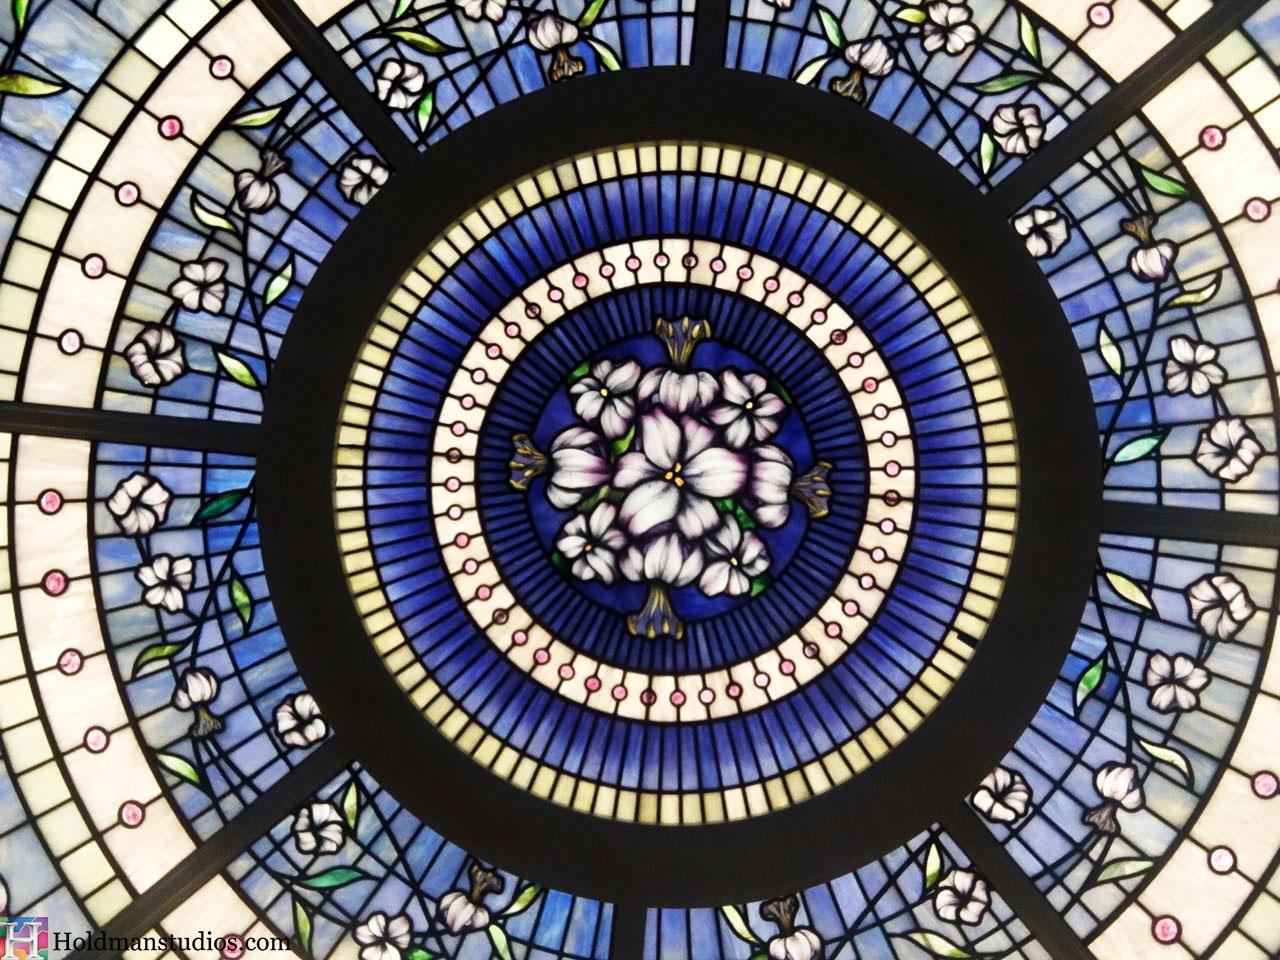 Holdman-Studios-Stained-Glass-Paris-LDS-Temple-Martagon-Lily-Flowers-Leaves-Sun-Moon-Stars-Round-Rose-Skylight-Window.jpg